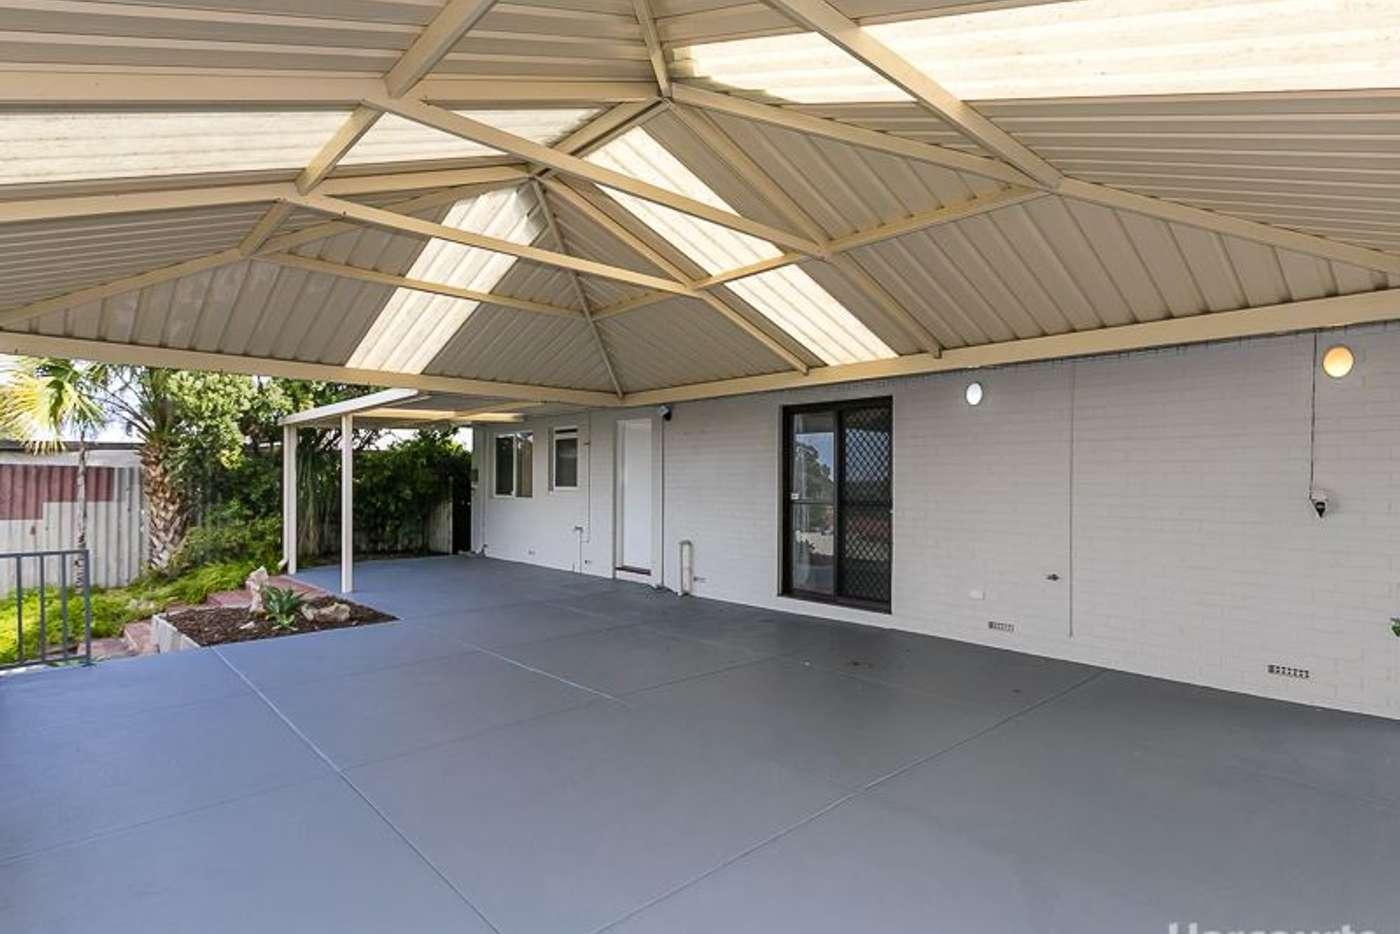 Seventh view of Homely house listing, 34 Flotilla Drive, Heathridge WA 6027